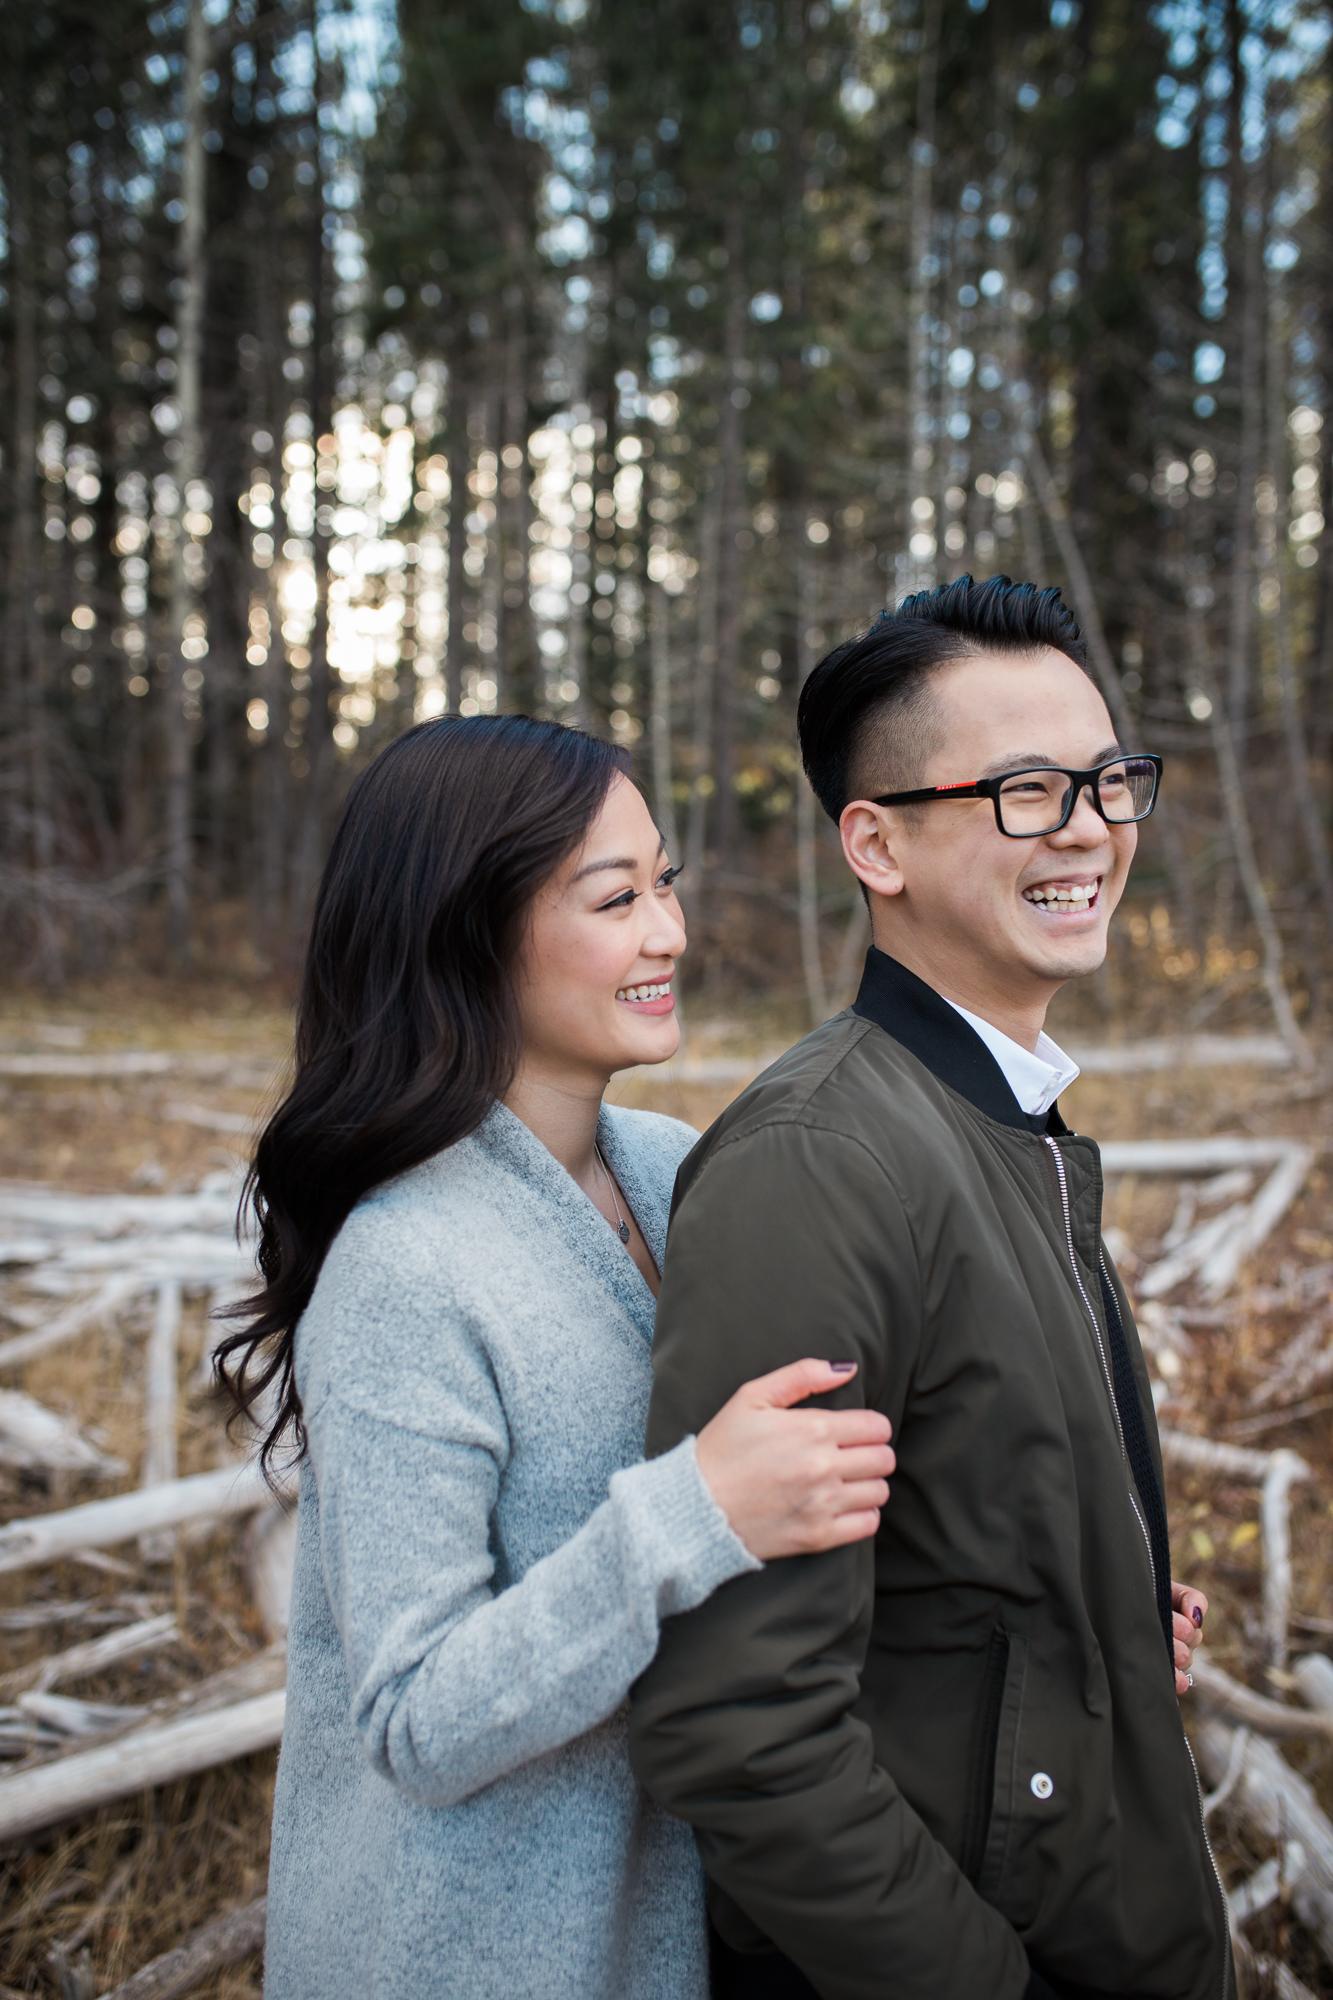 Calgary-Wedding-Photographer-DR-9.jpg